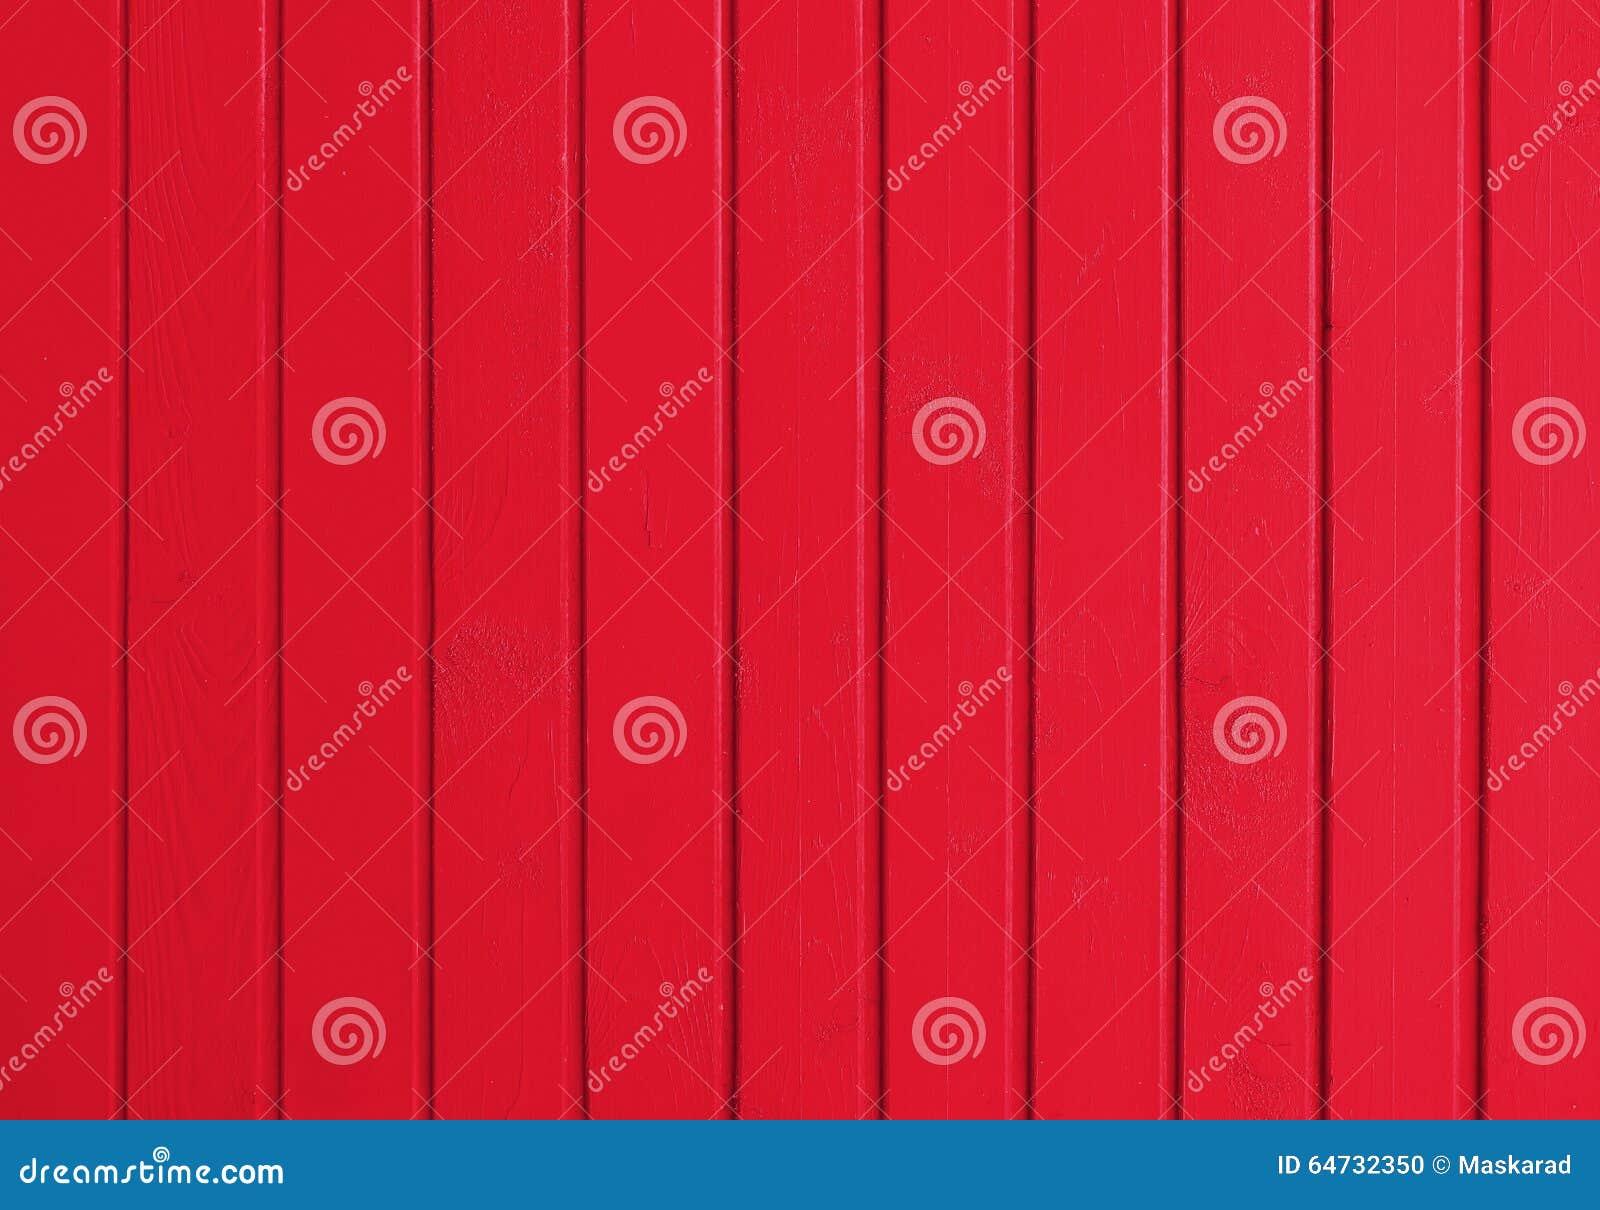 Fondo dai bordi dipinti da pittura rossa